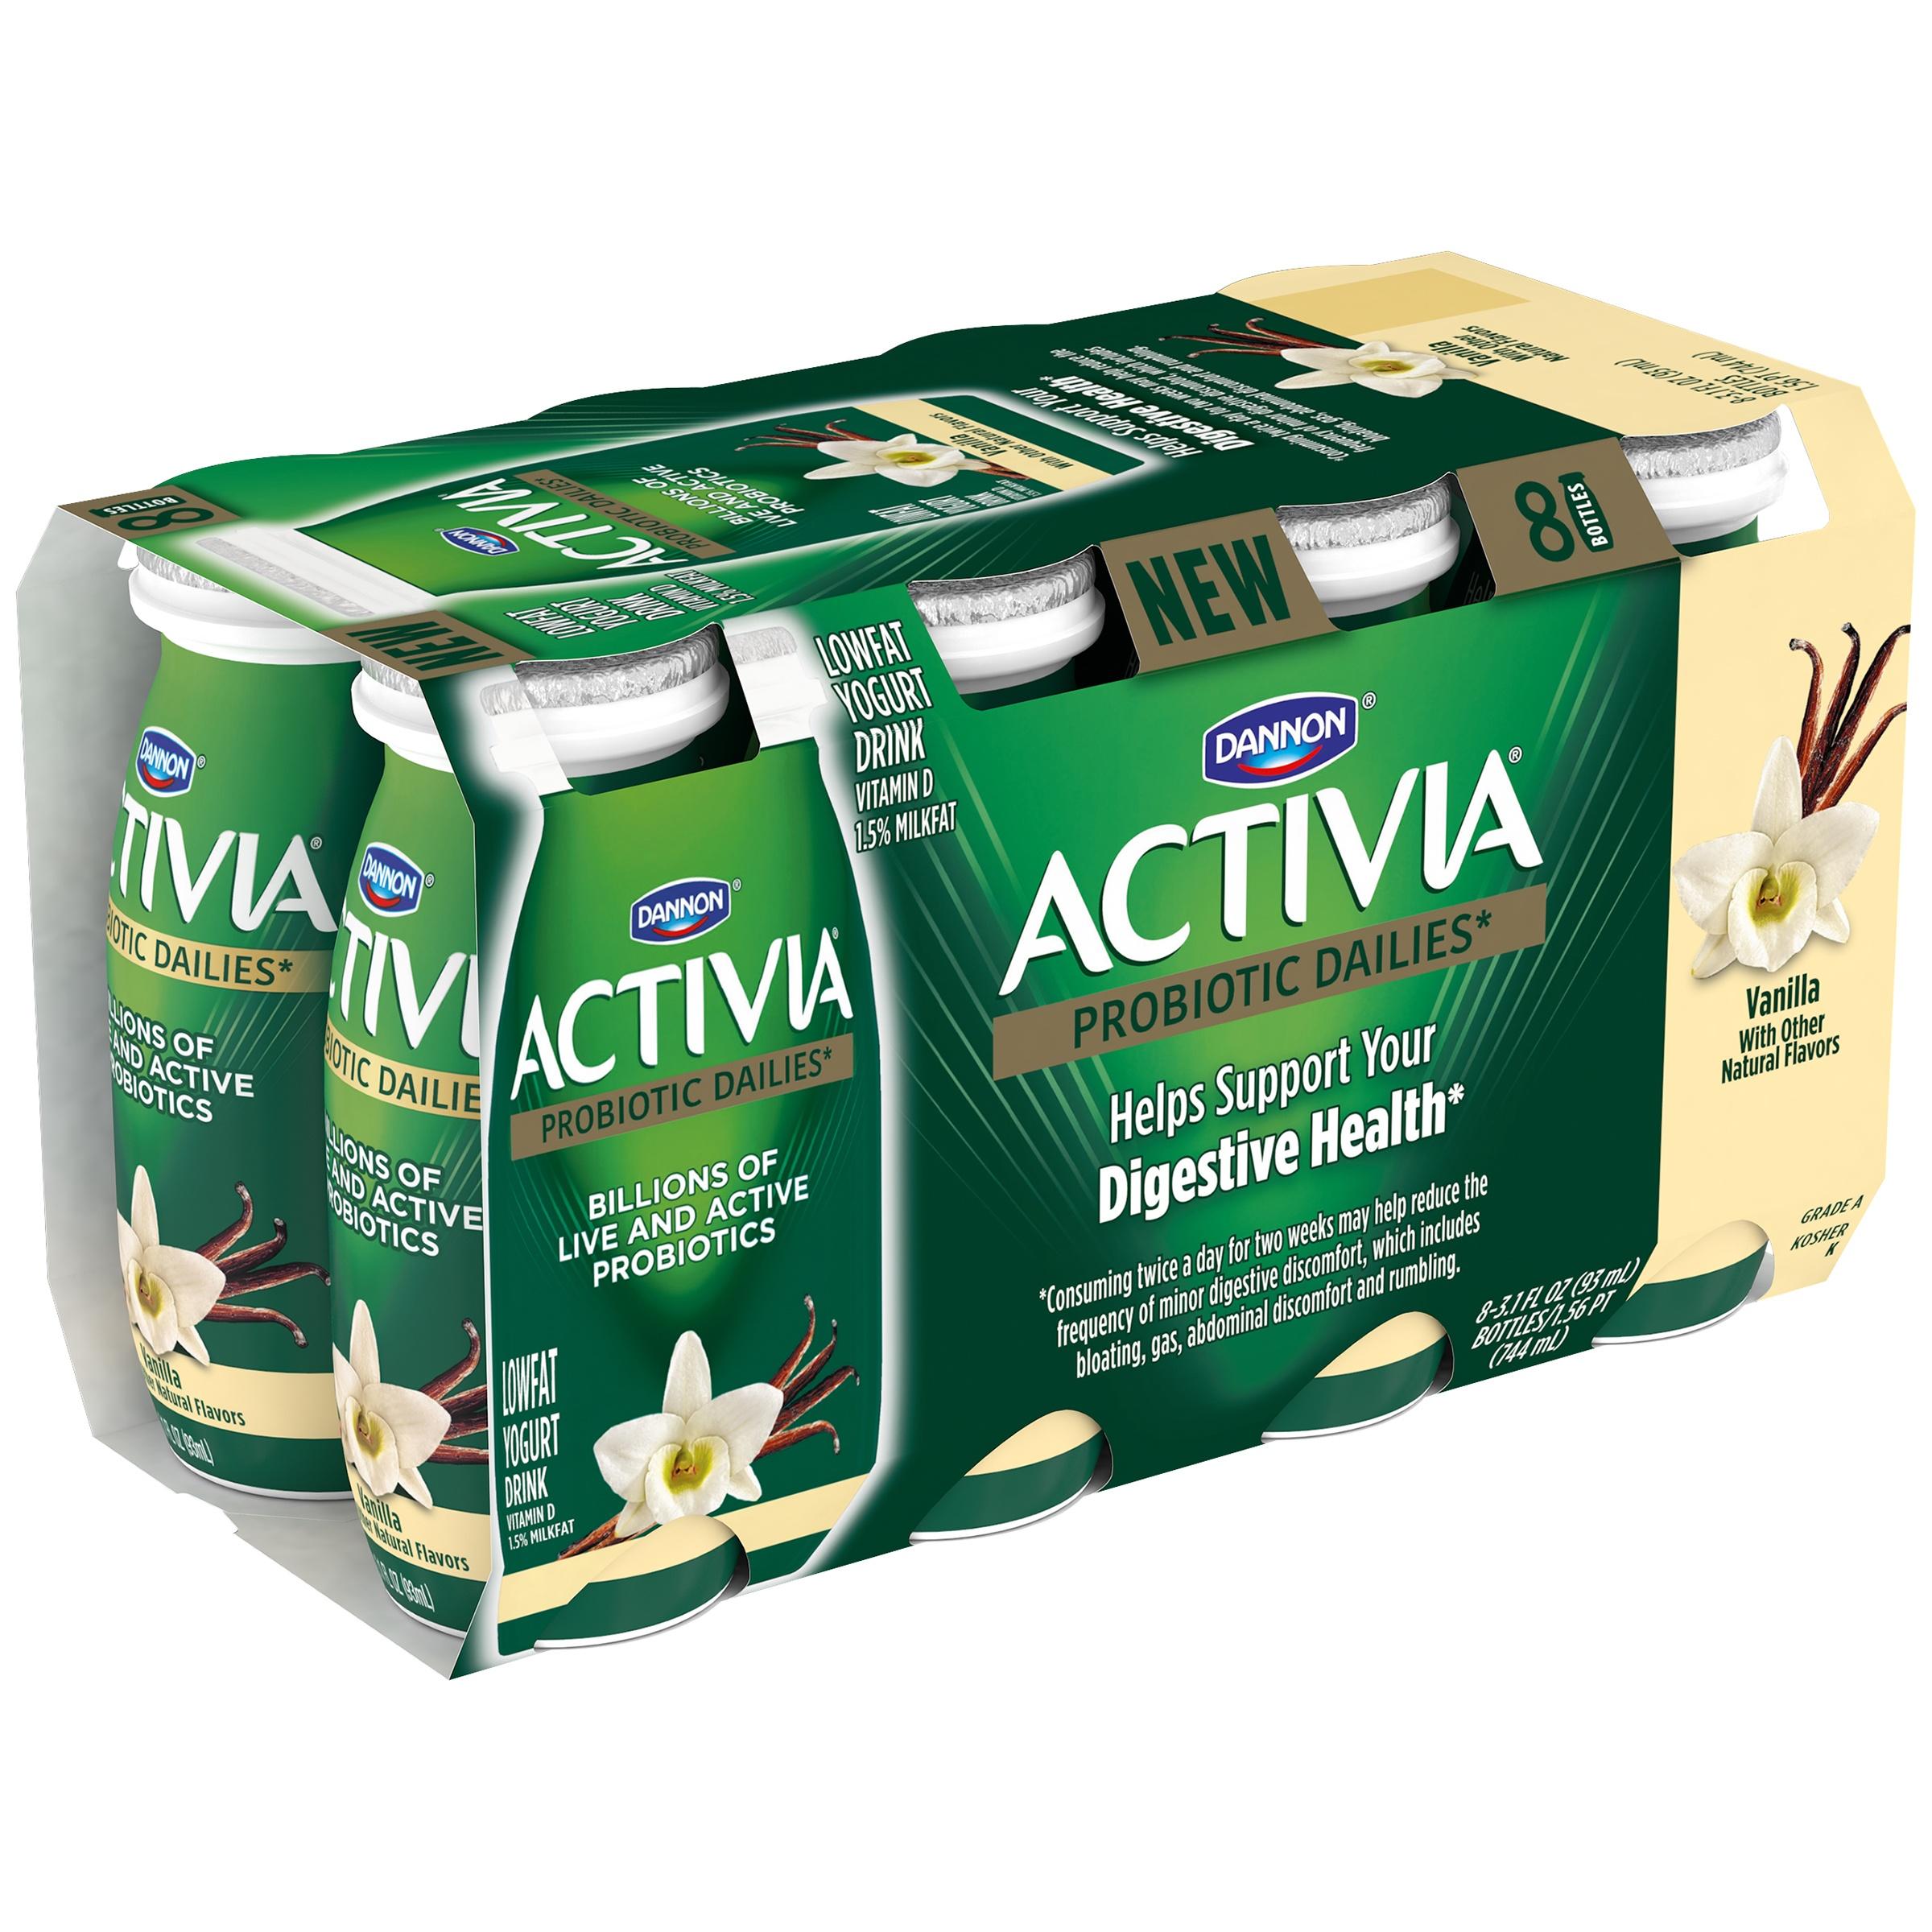 V8 Energy Review >> Dannon Activia Probiotic Dailies Low Fat Vanilla Yogurt Drink, 3.1 Fl. Oz., 8 Bottles - Walmart.com